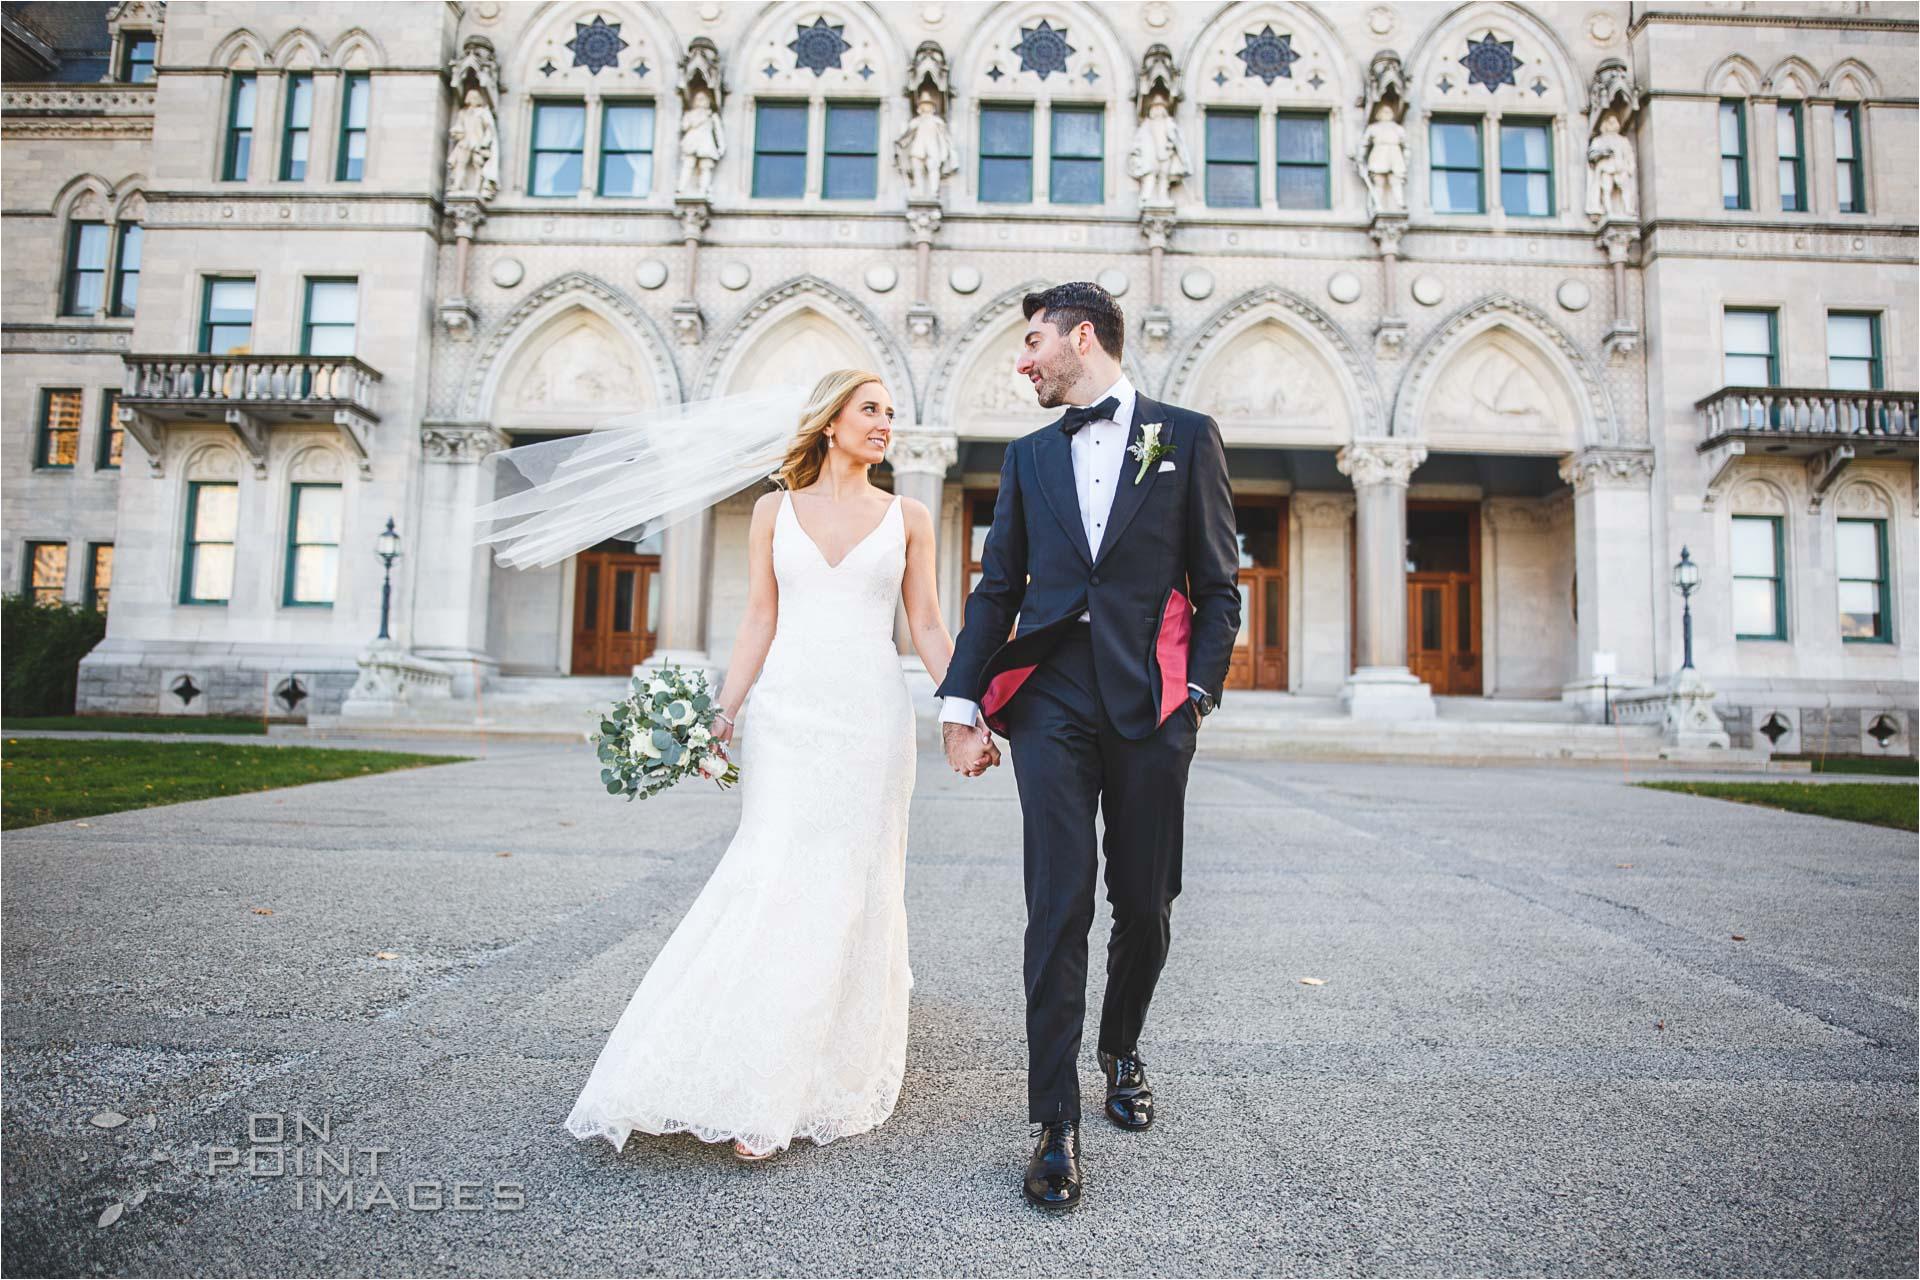 marquee-events-wedding-hartford-ct-01.jpg